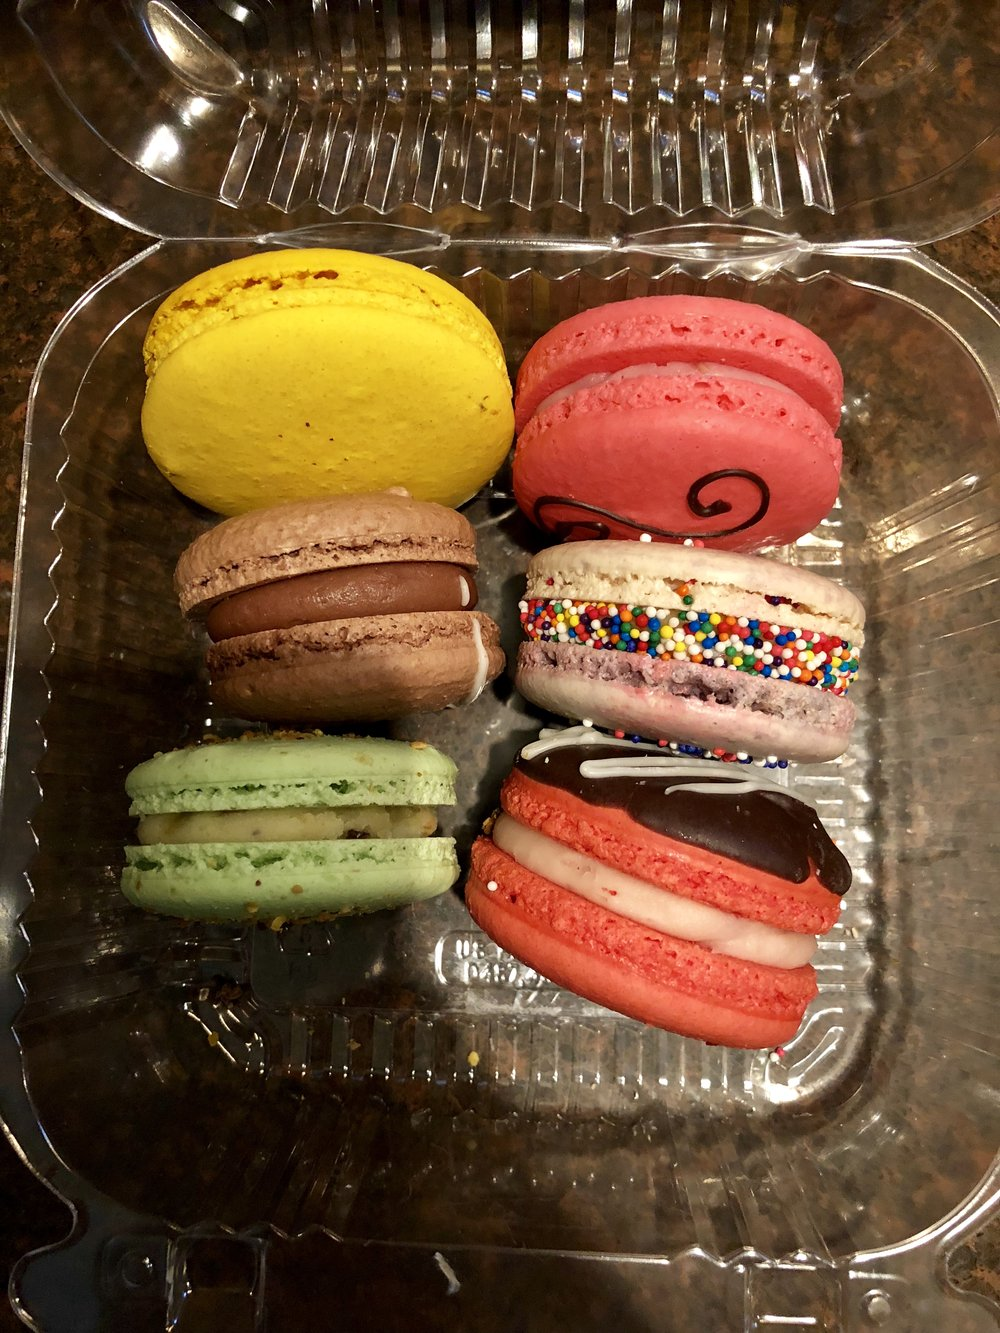 Macarons To Go